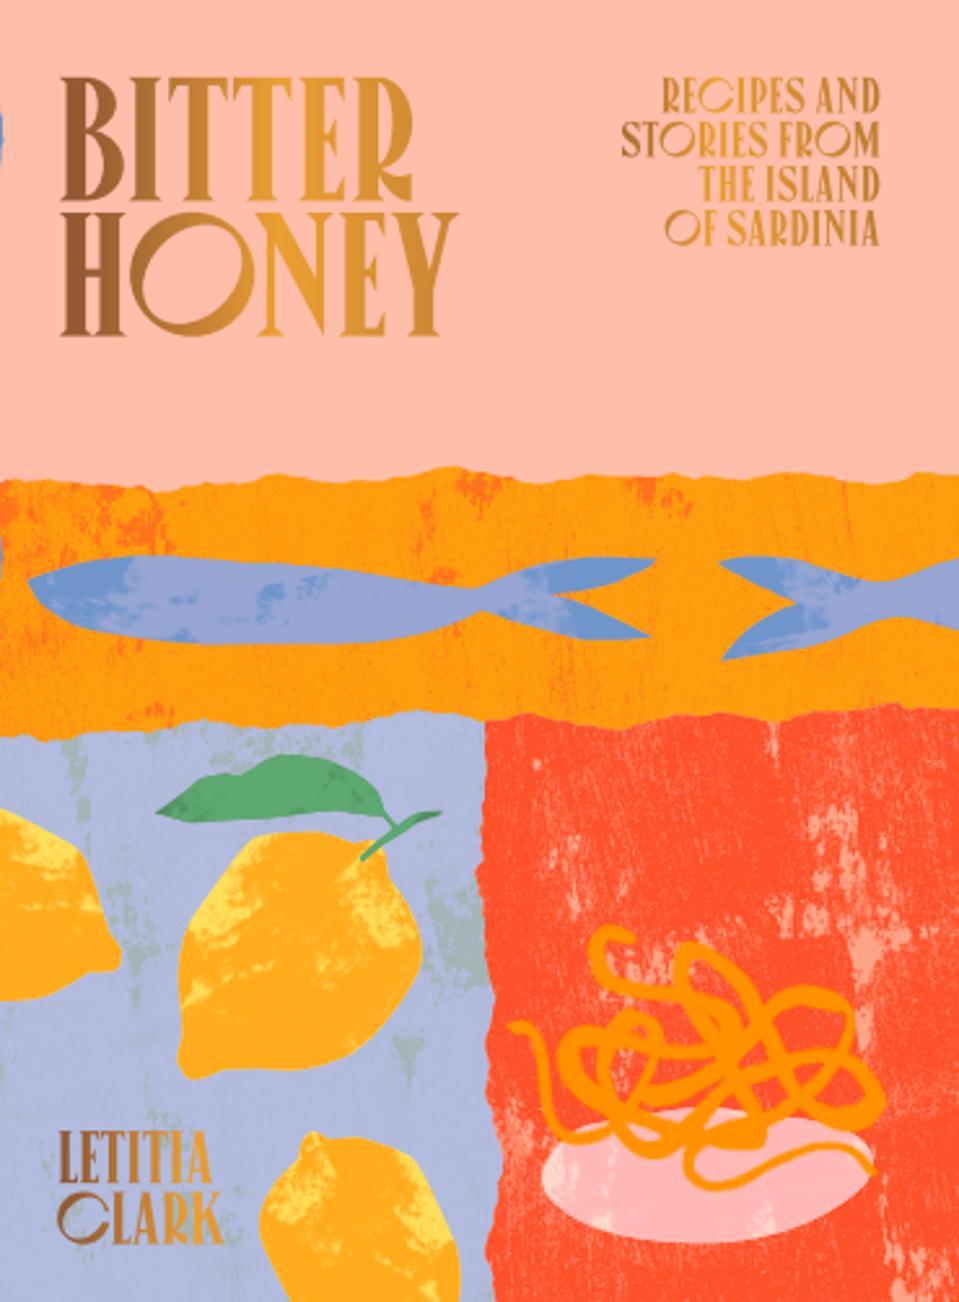 Bitter Honey cookbook